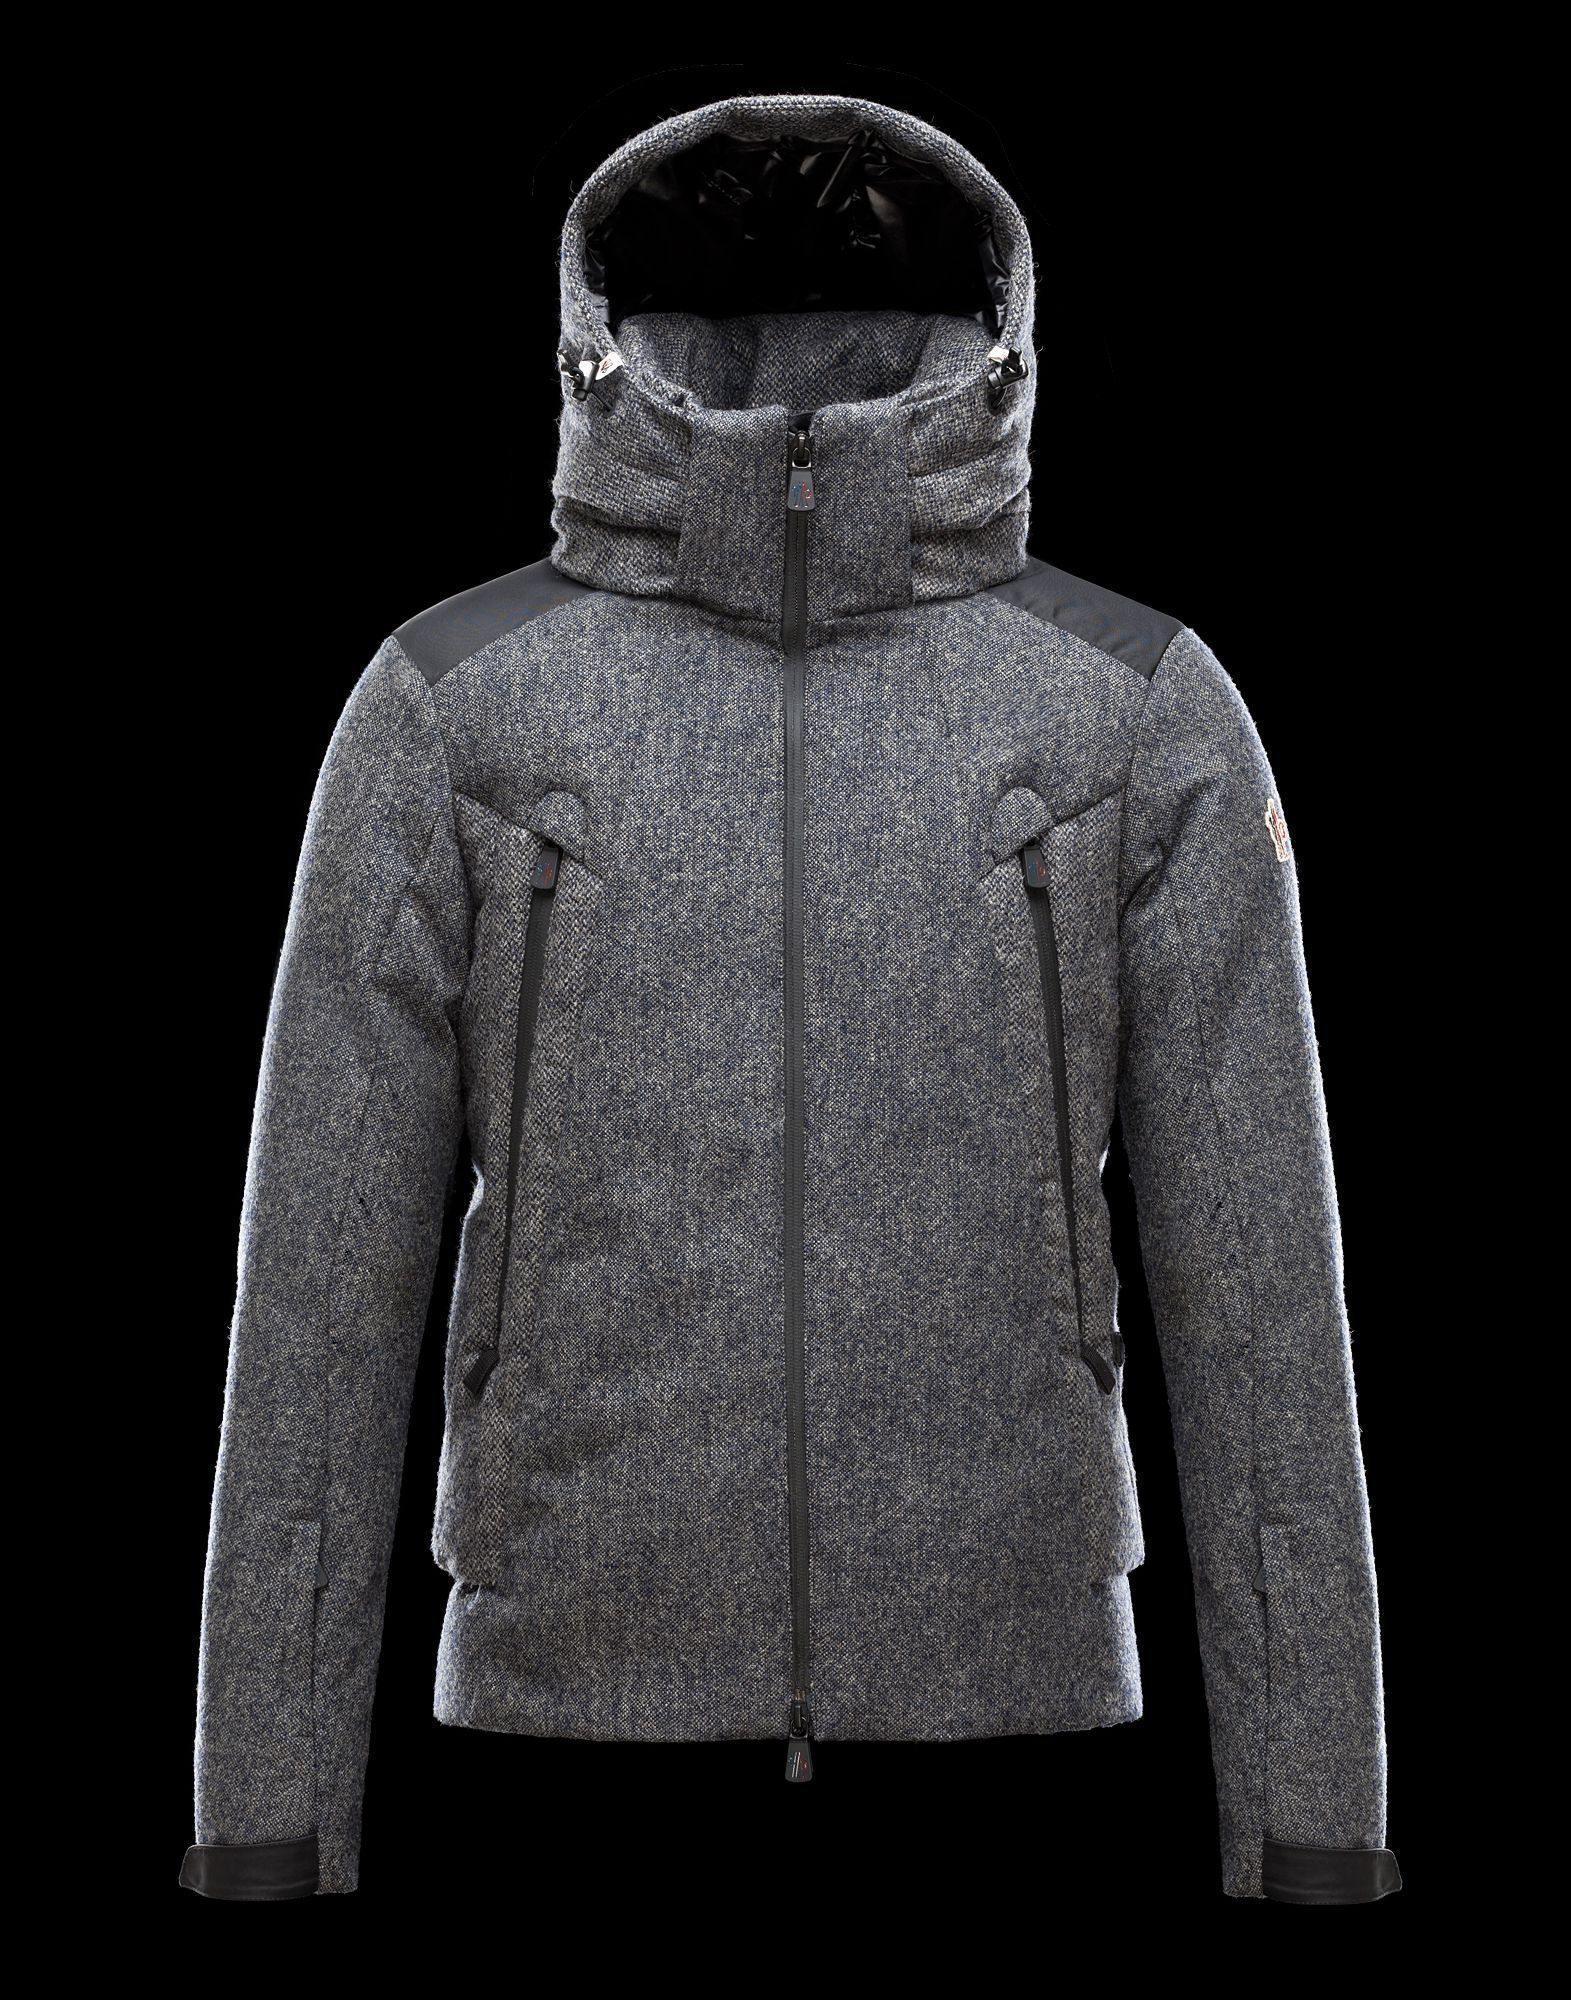 MONCLER GRENOBLE Men Fall/Winter 12 OUTERWEAR Jacket